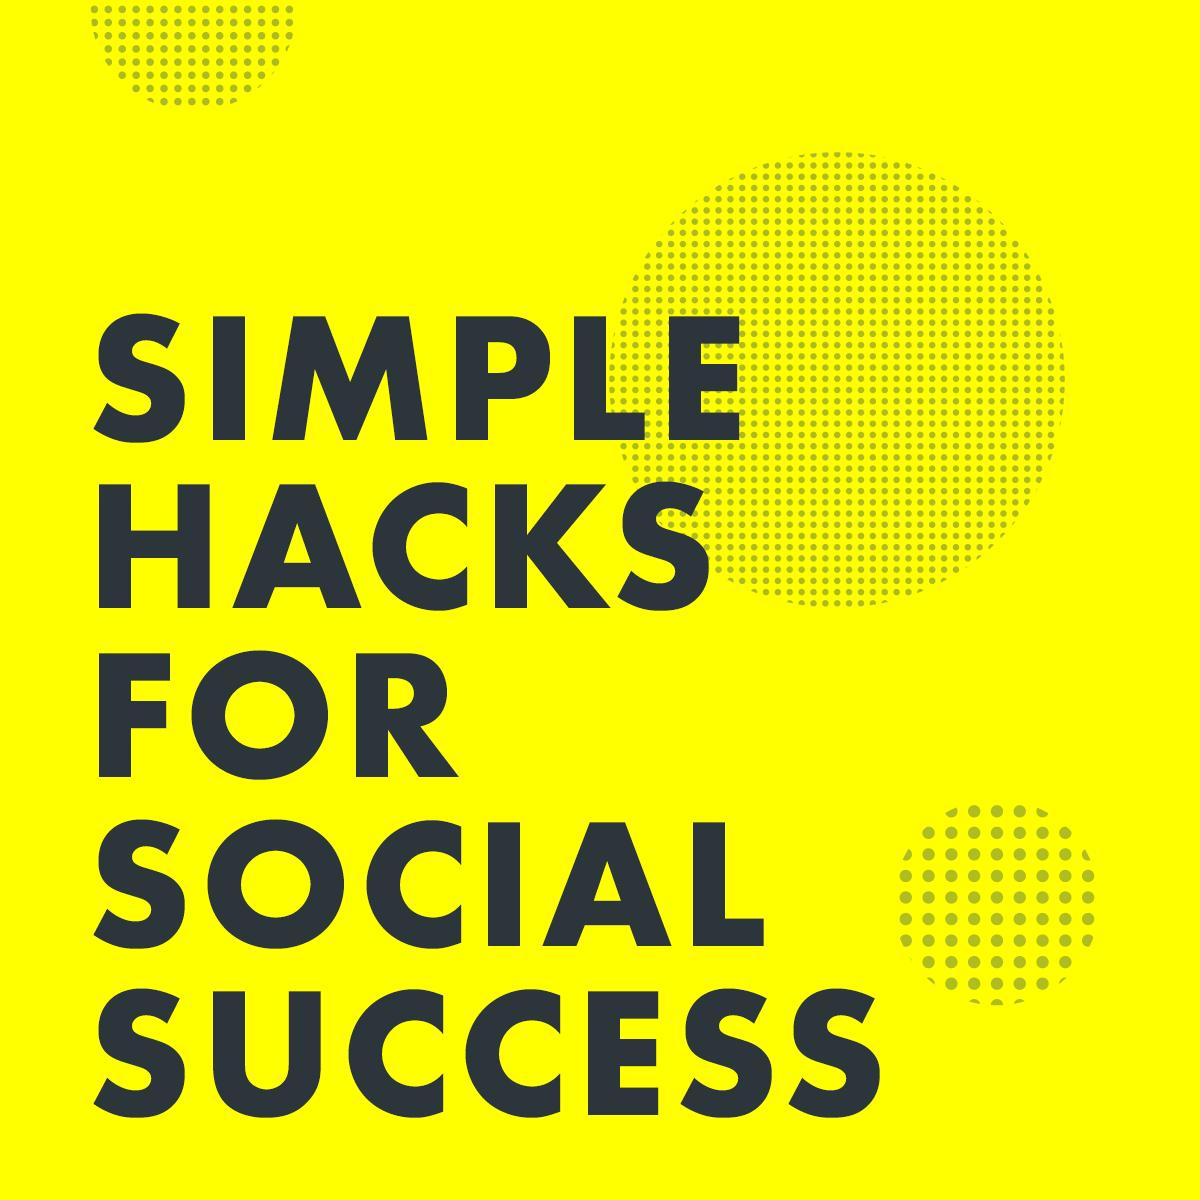 Simple Hacks for Social Success